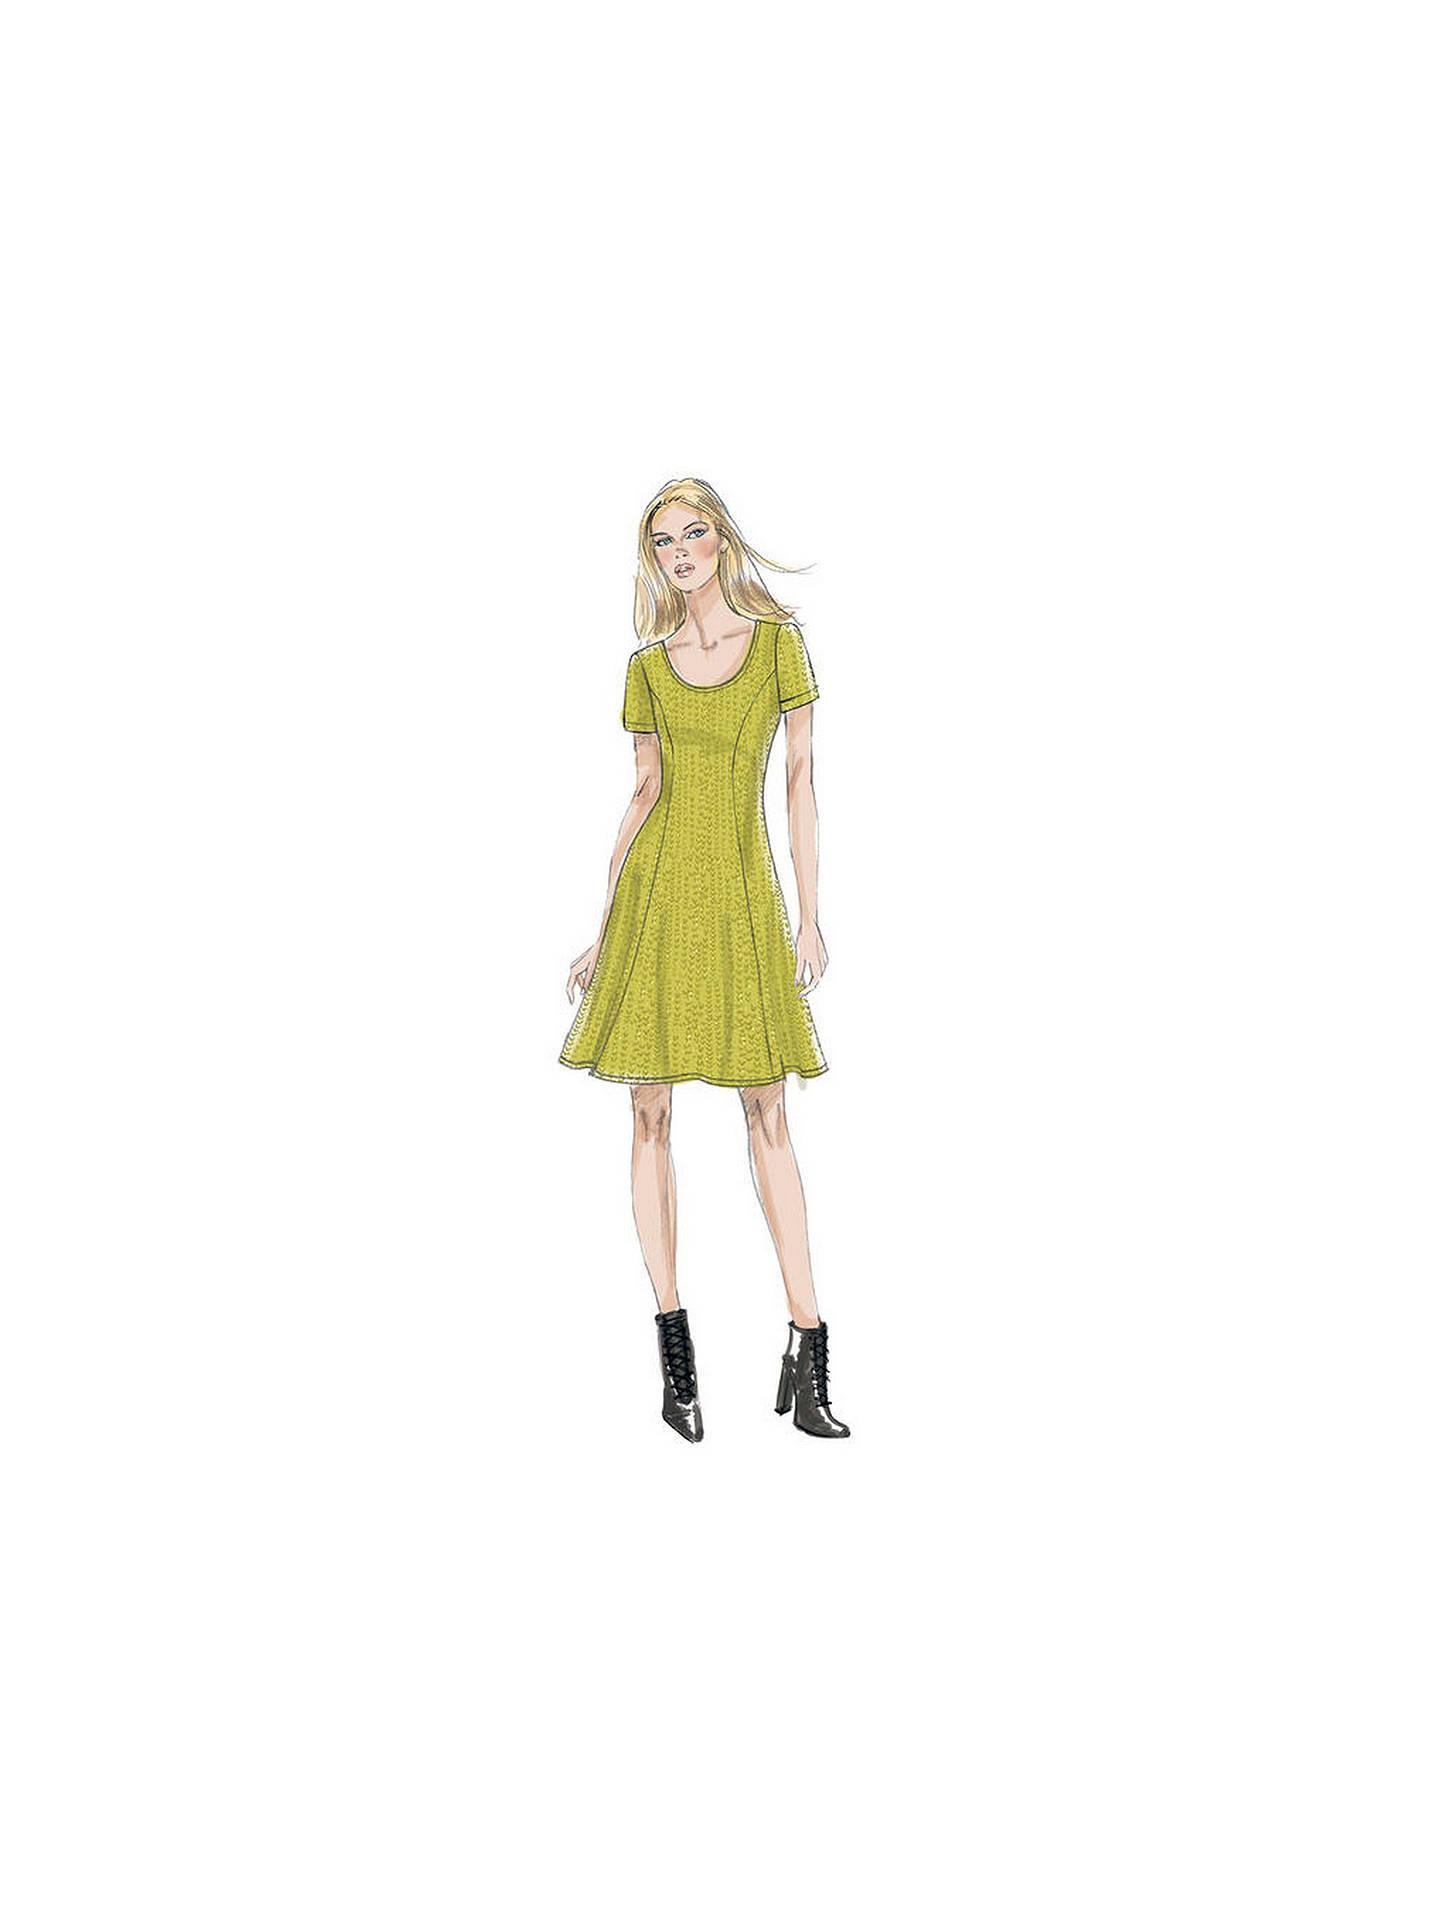 Vogue Women\'s Knit Dress Sewing Pattern, 9199 at John Lewis & Partners